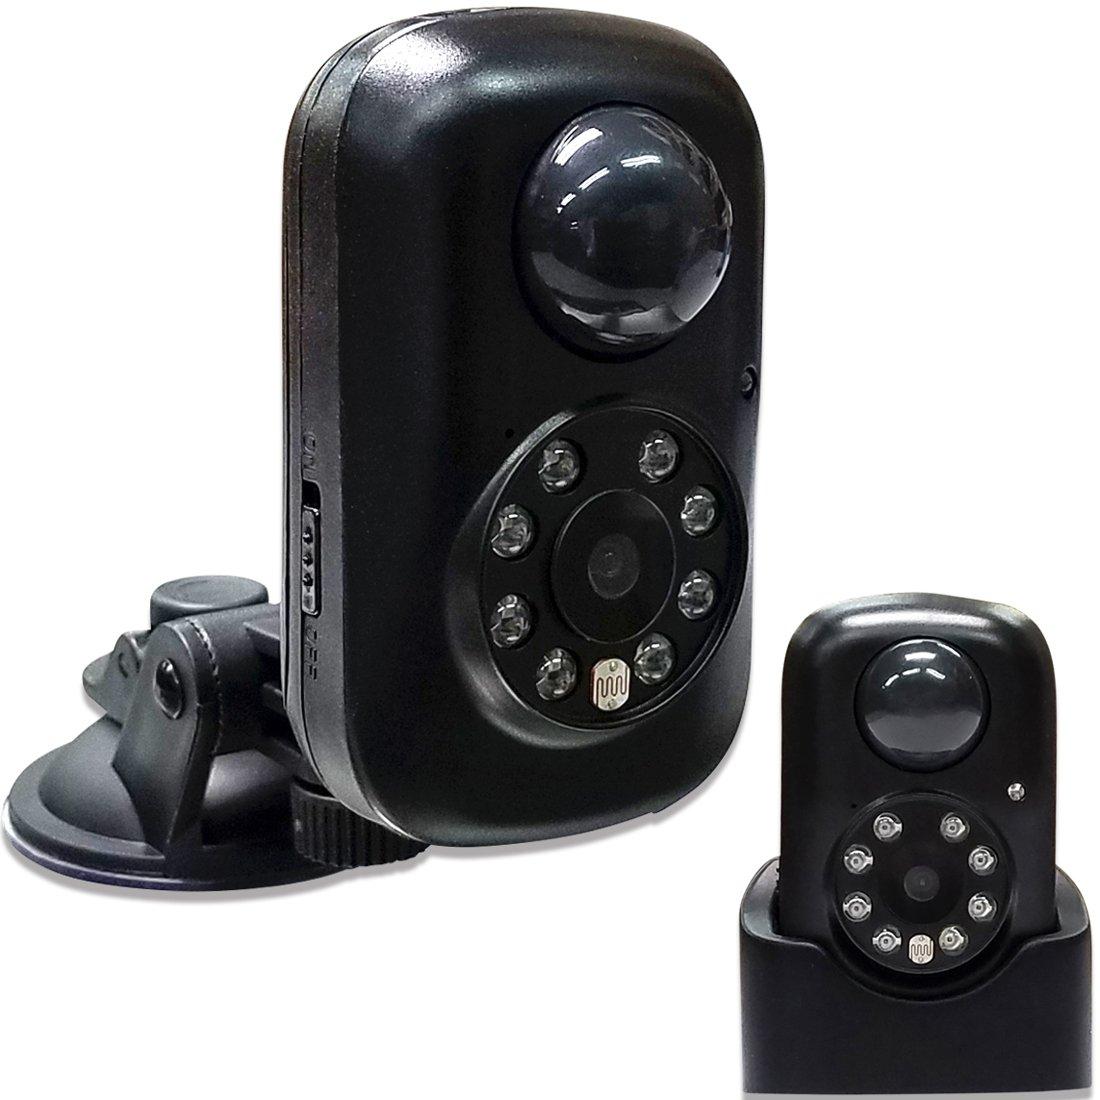 Hanwha 小型 赤外線 防犯カメラ 監視カメラ SDカード録画 人体検知センサー搭載 [バッテリー内蔵][配線不要][夜間撮影][人感センサー][SDHCカード付属] DVR-Q2(8GB) B006T785NC 1.DVR-Q2 小型 防犯監視カメラ 1.DVR-Q2 小型 防犯監視カメラ